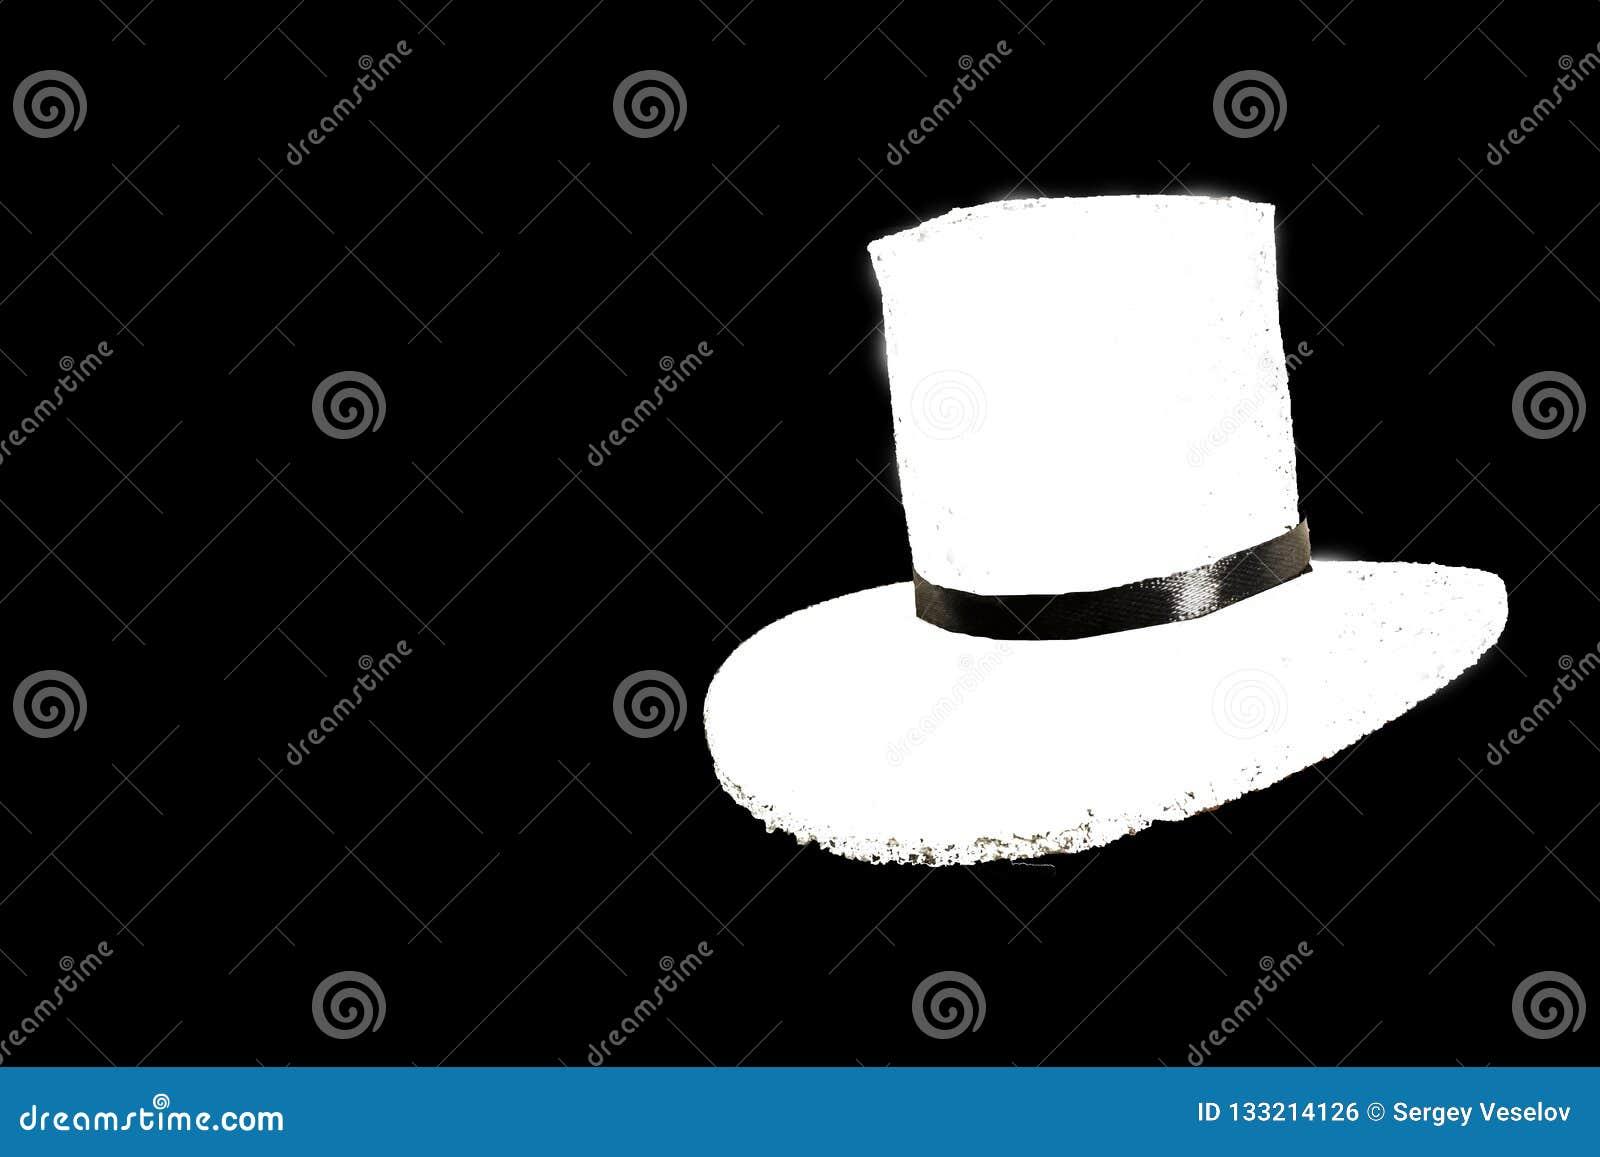 Sombrero blanco de moda aislado en fondo negro